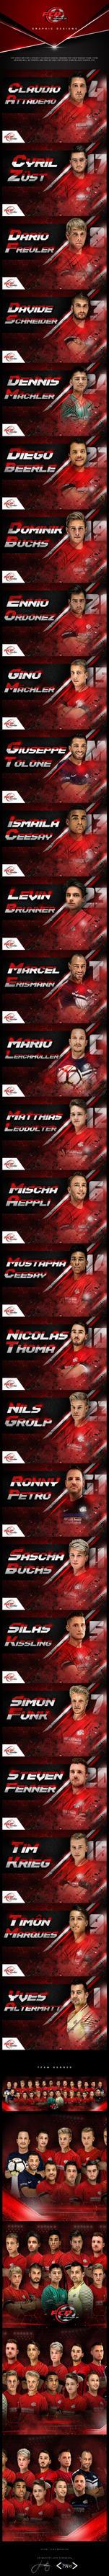 FCP Team Designs by tmaclabi